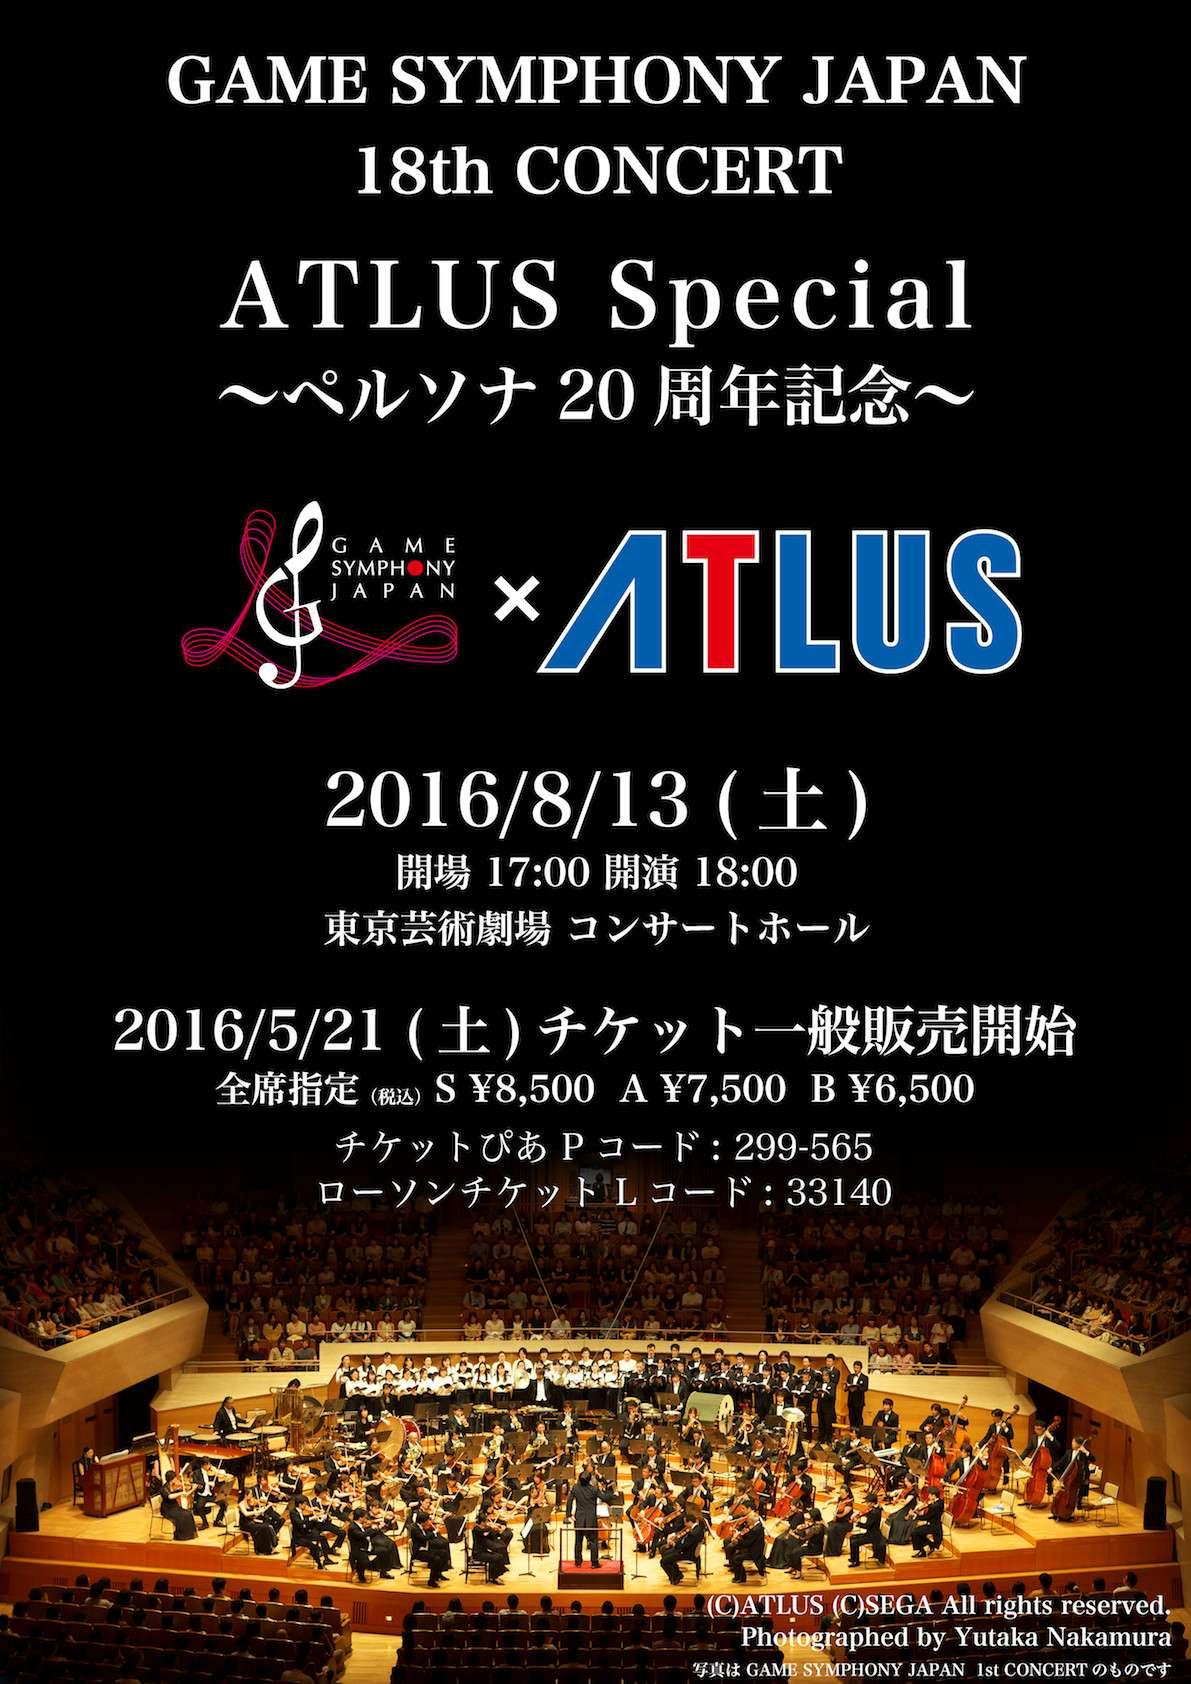 Atlus Special Concert